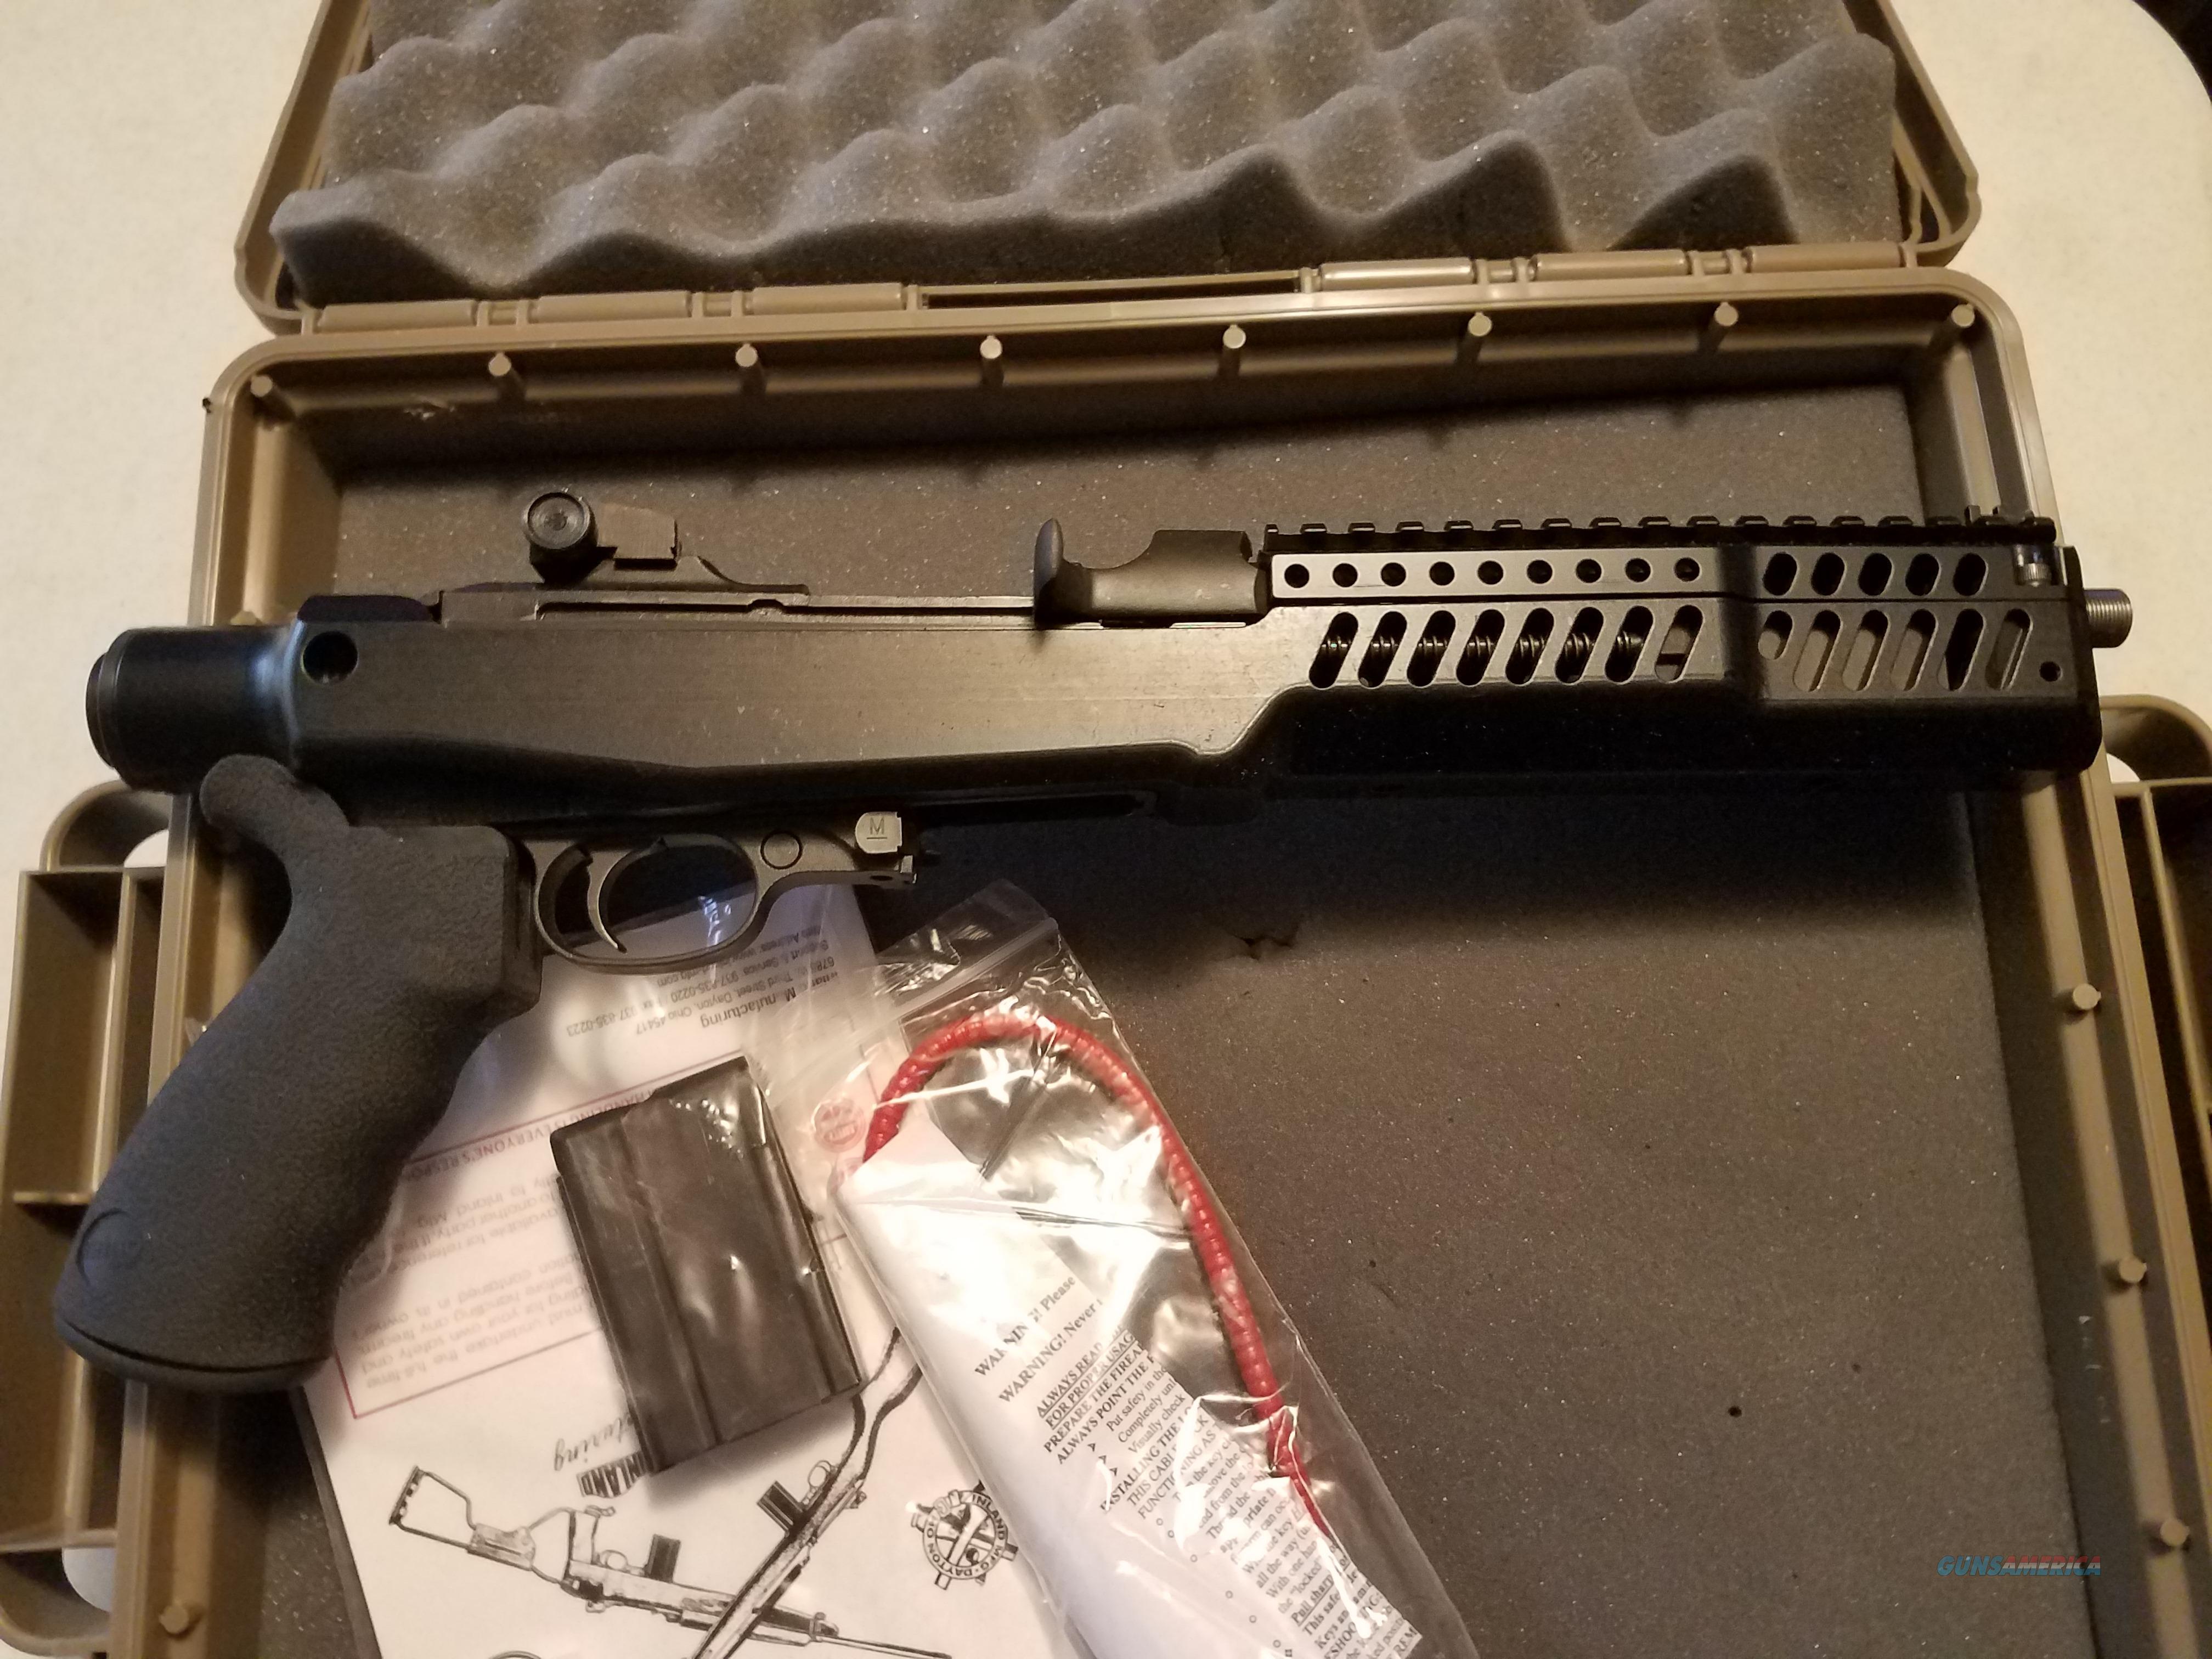 Inland Motor Patrol Pistol M30-IMP Pistol  Guns > Pistols > Inland Manufacturing Pistols